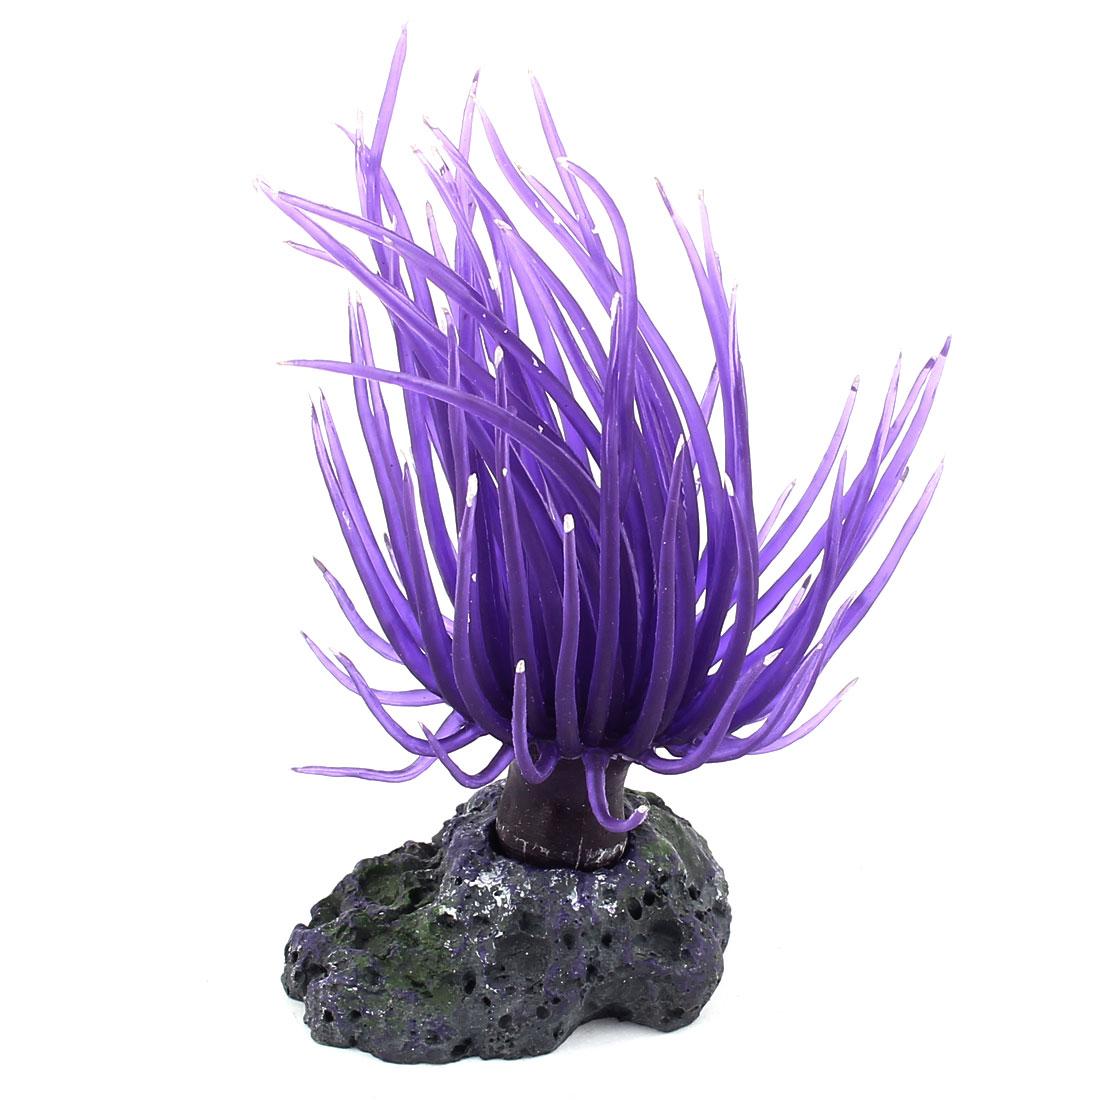 Purple Silicone Ceramic Base Artificial Aquarium Aquatic Coral Ornament for Fishbowl Fish Tank